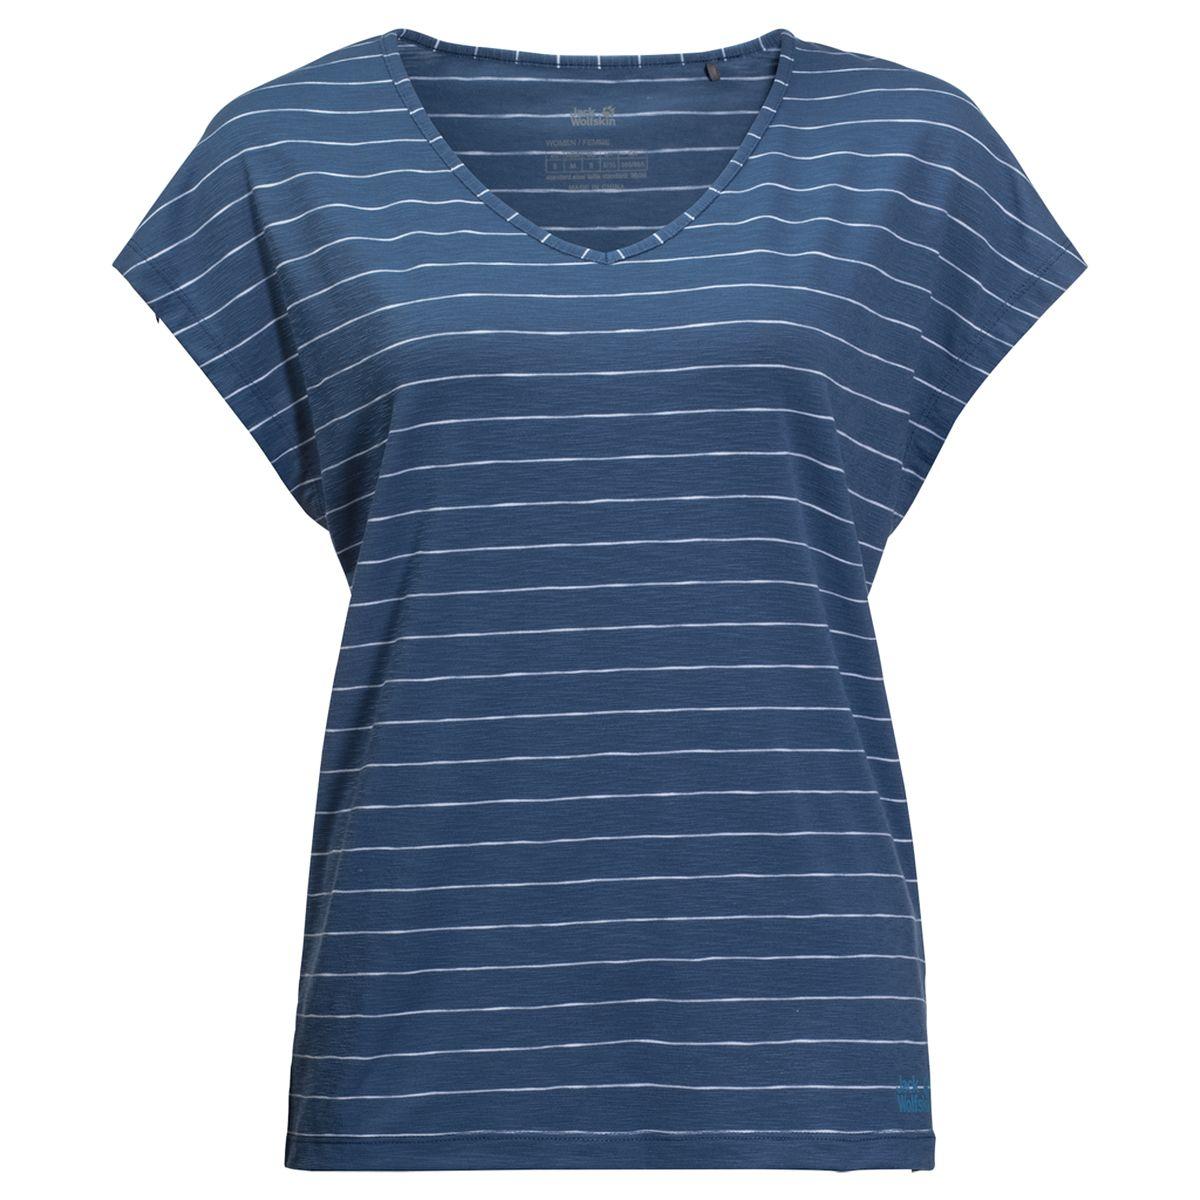 Фото - Футболка Jack Wolfskin Travel Striped T W plus size front pocket striped asymmetric tunic t shirt